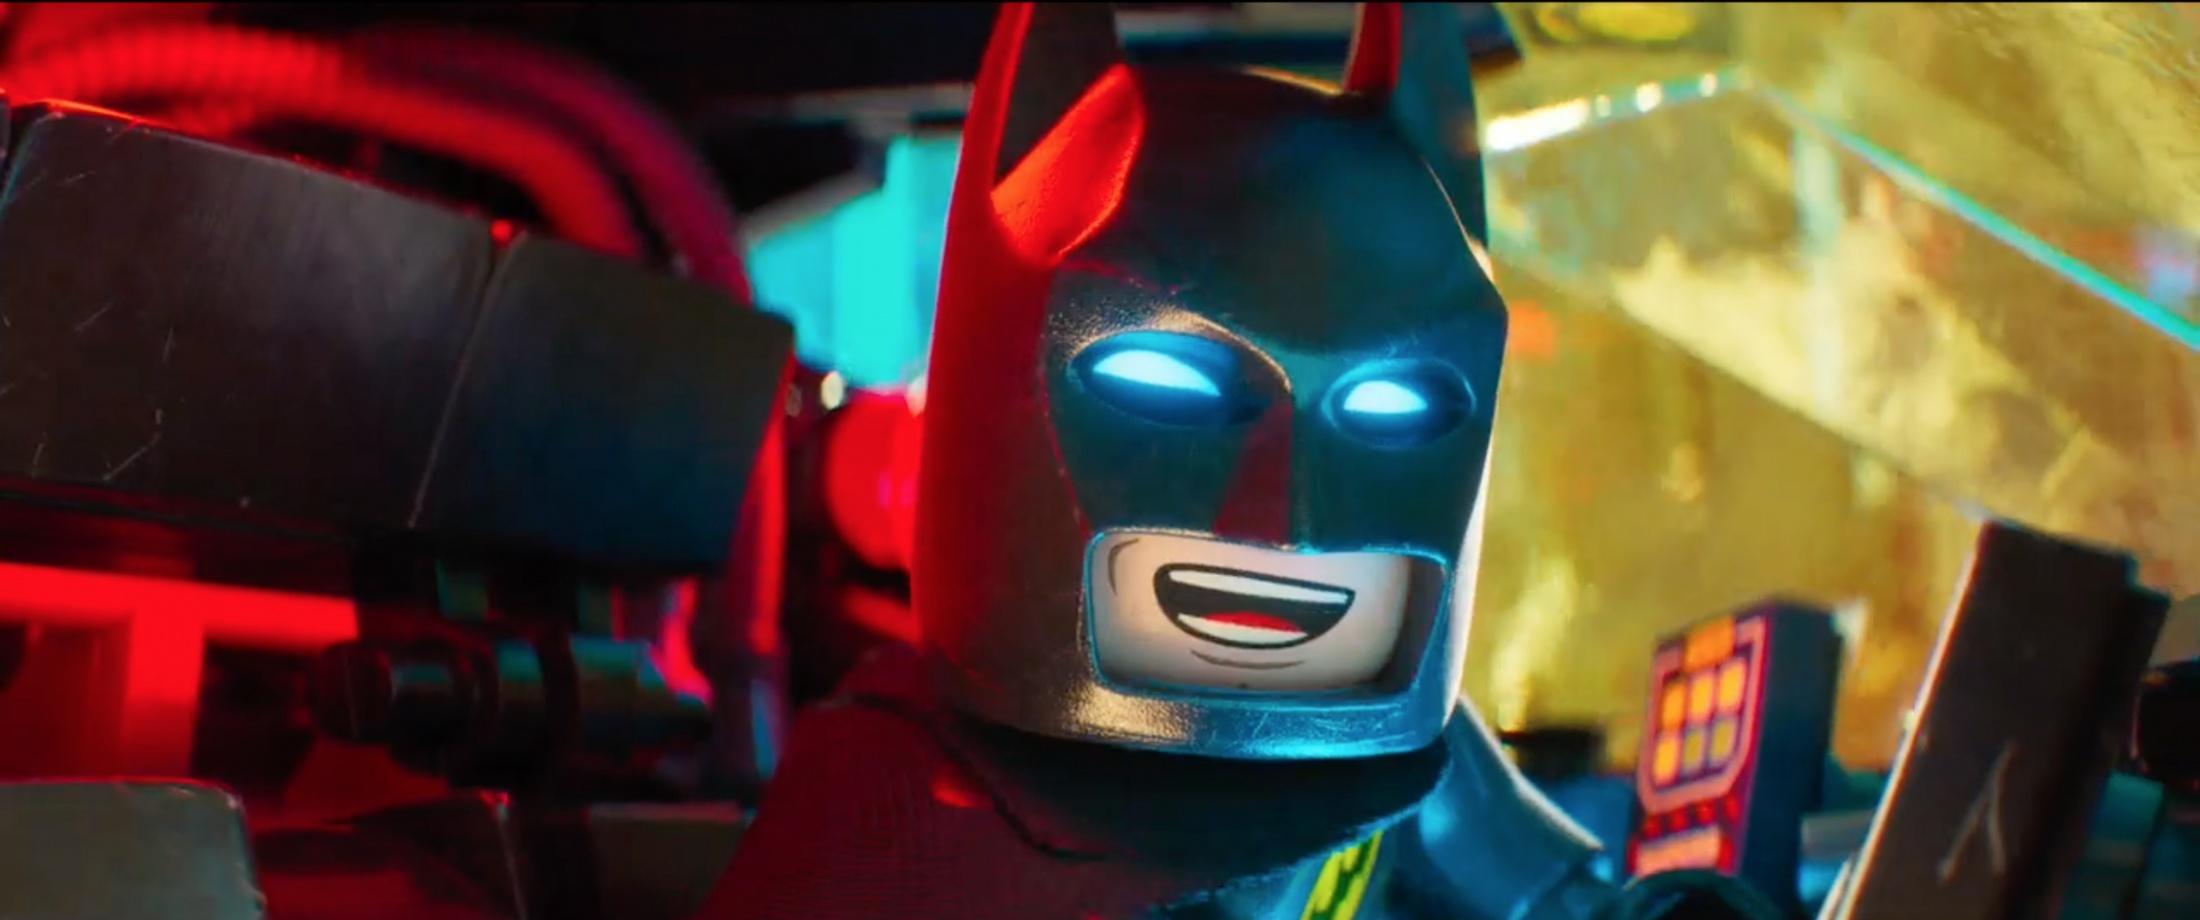 Thumbnail for LEGO Batman: One Brick at a Time